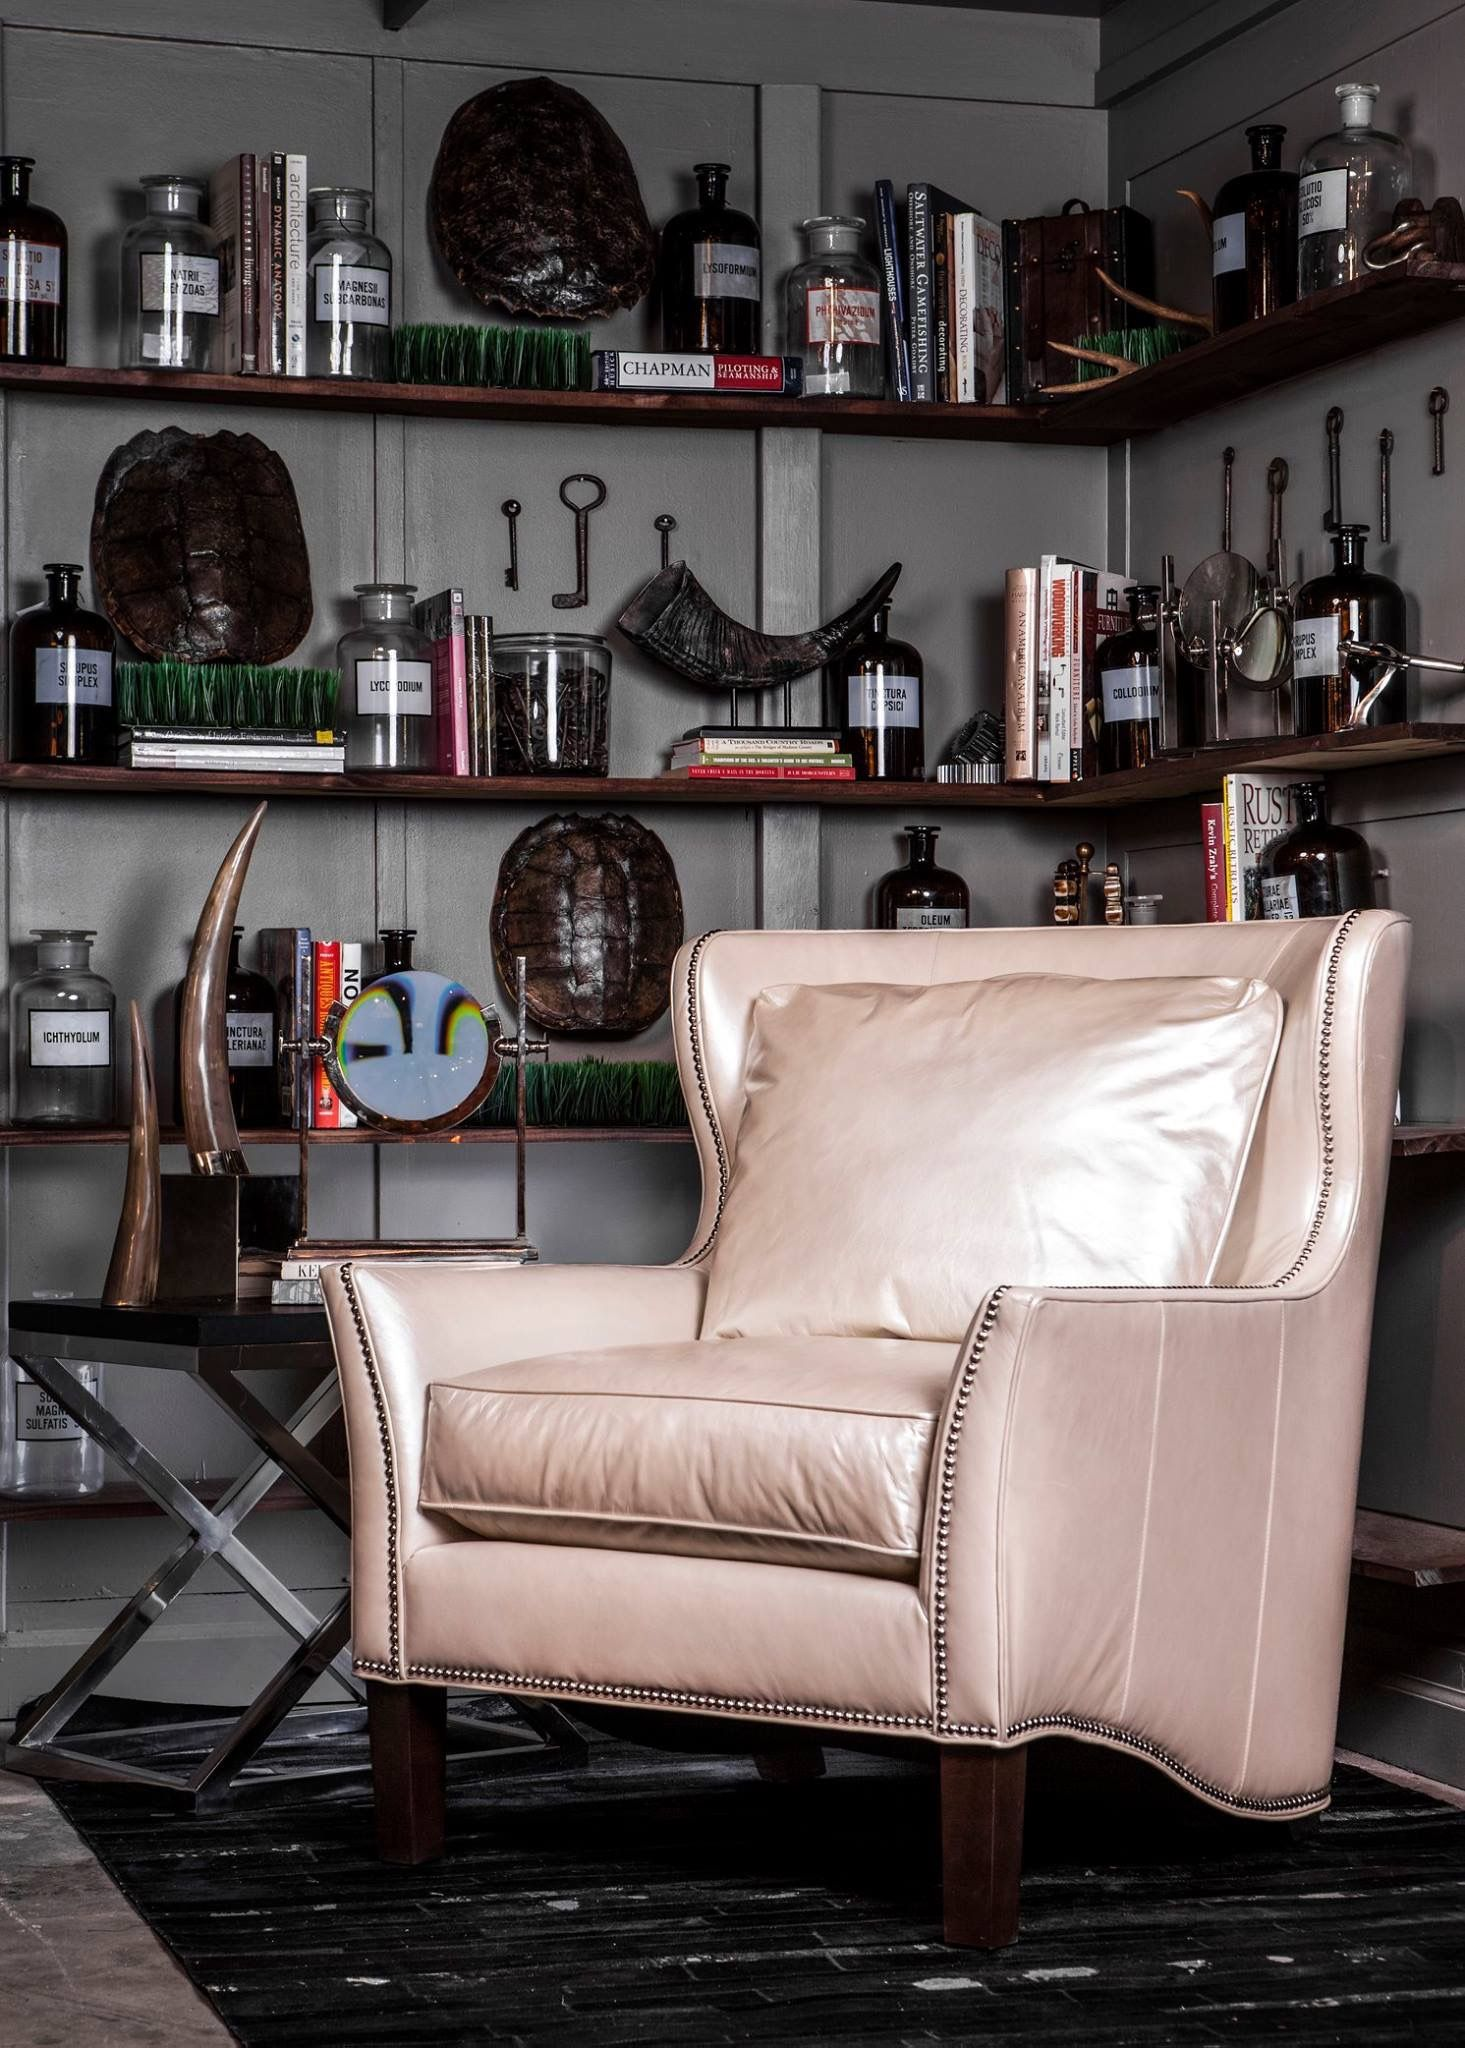 norwalk edinburgh chair upholstery pinterest edinburgh sofa